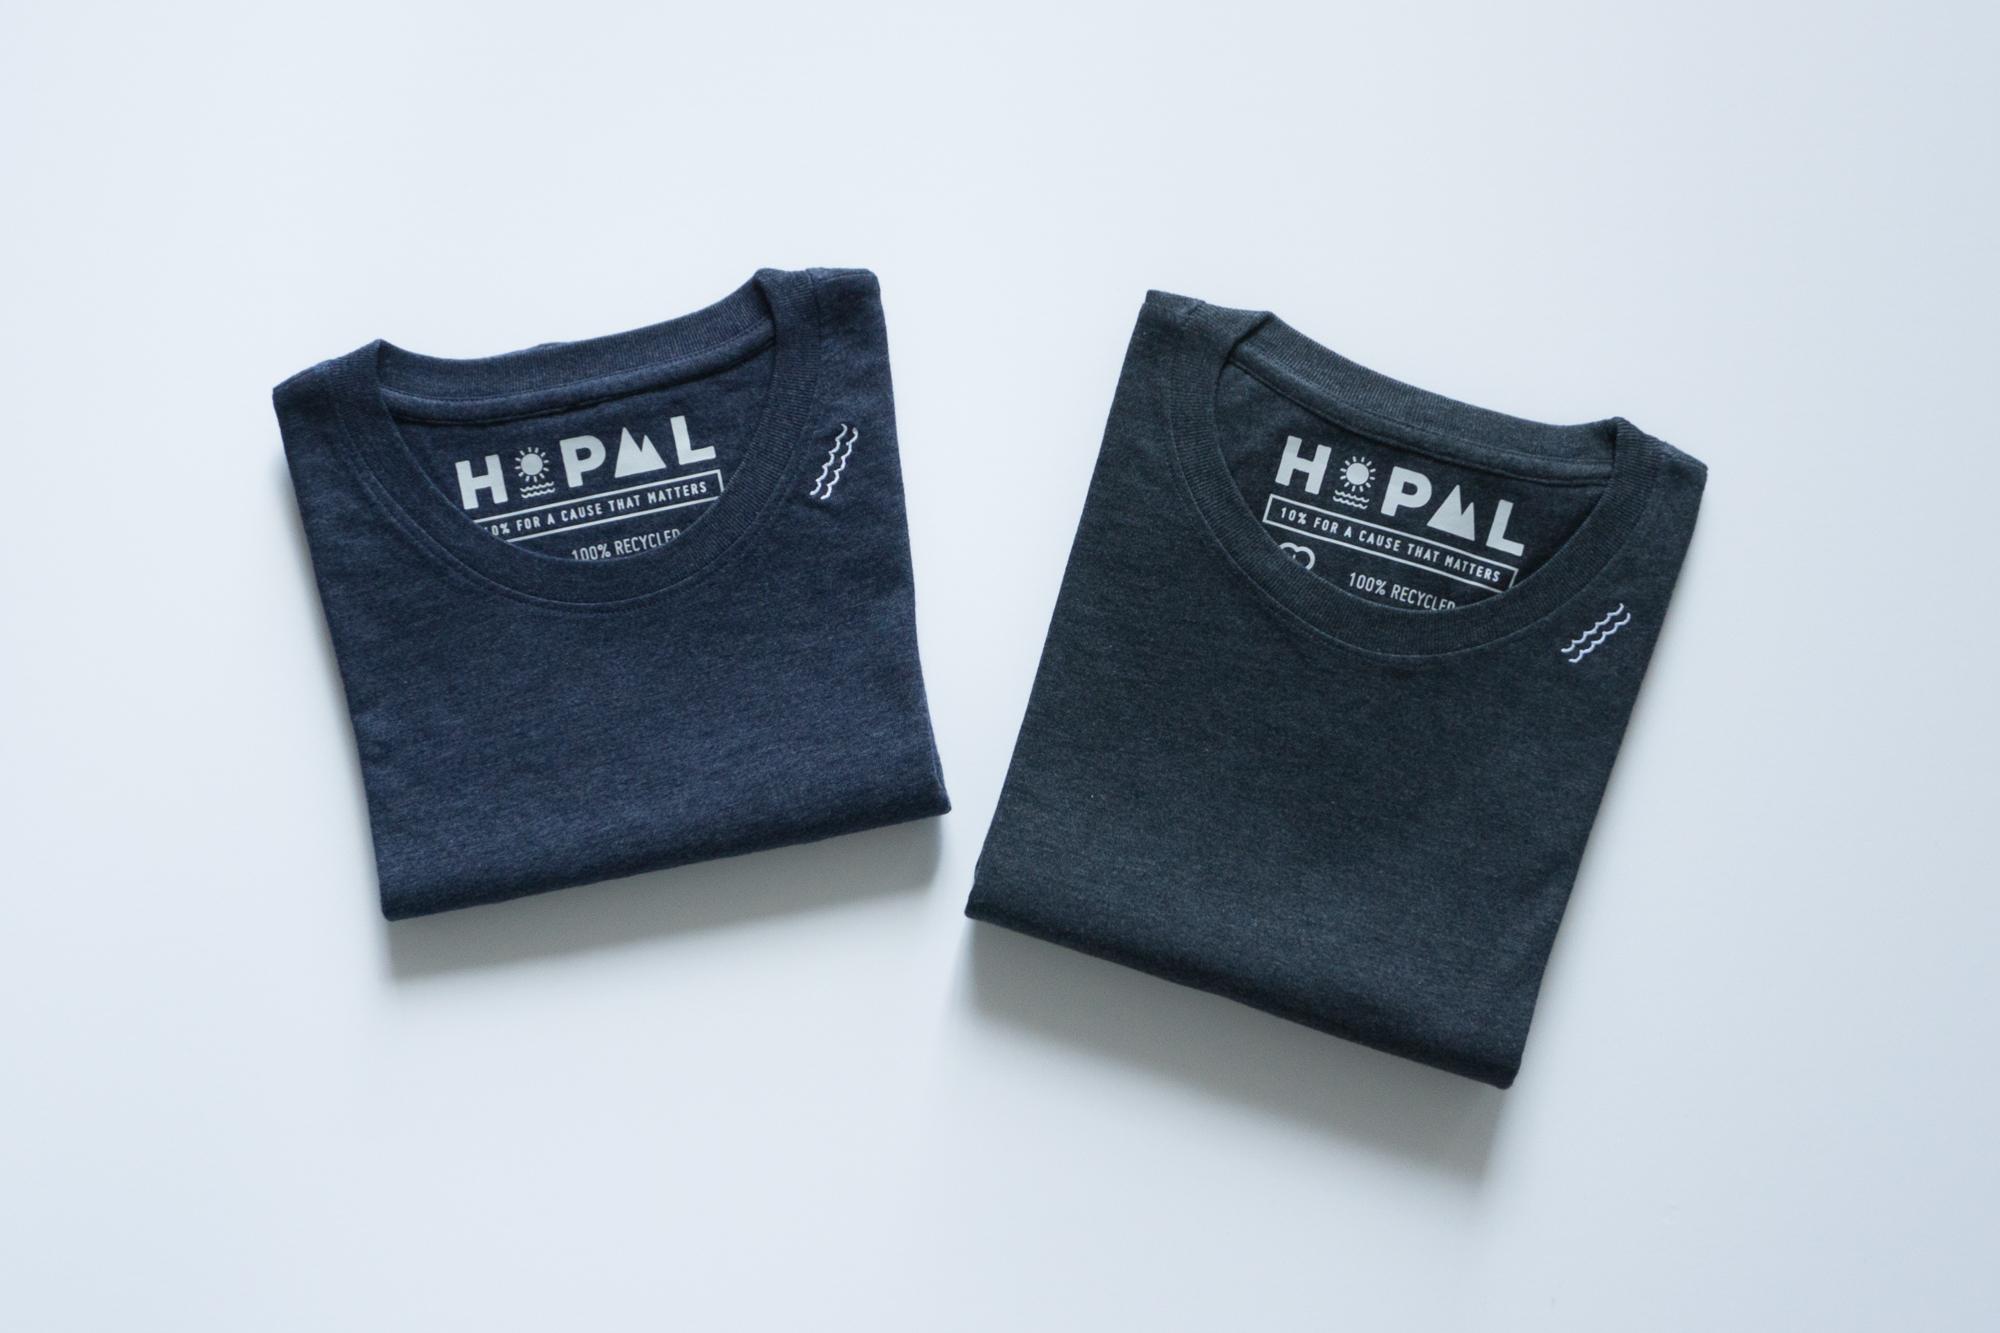 deux_t-shirts-1464612786.jpg